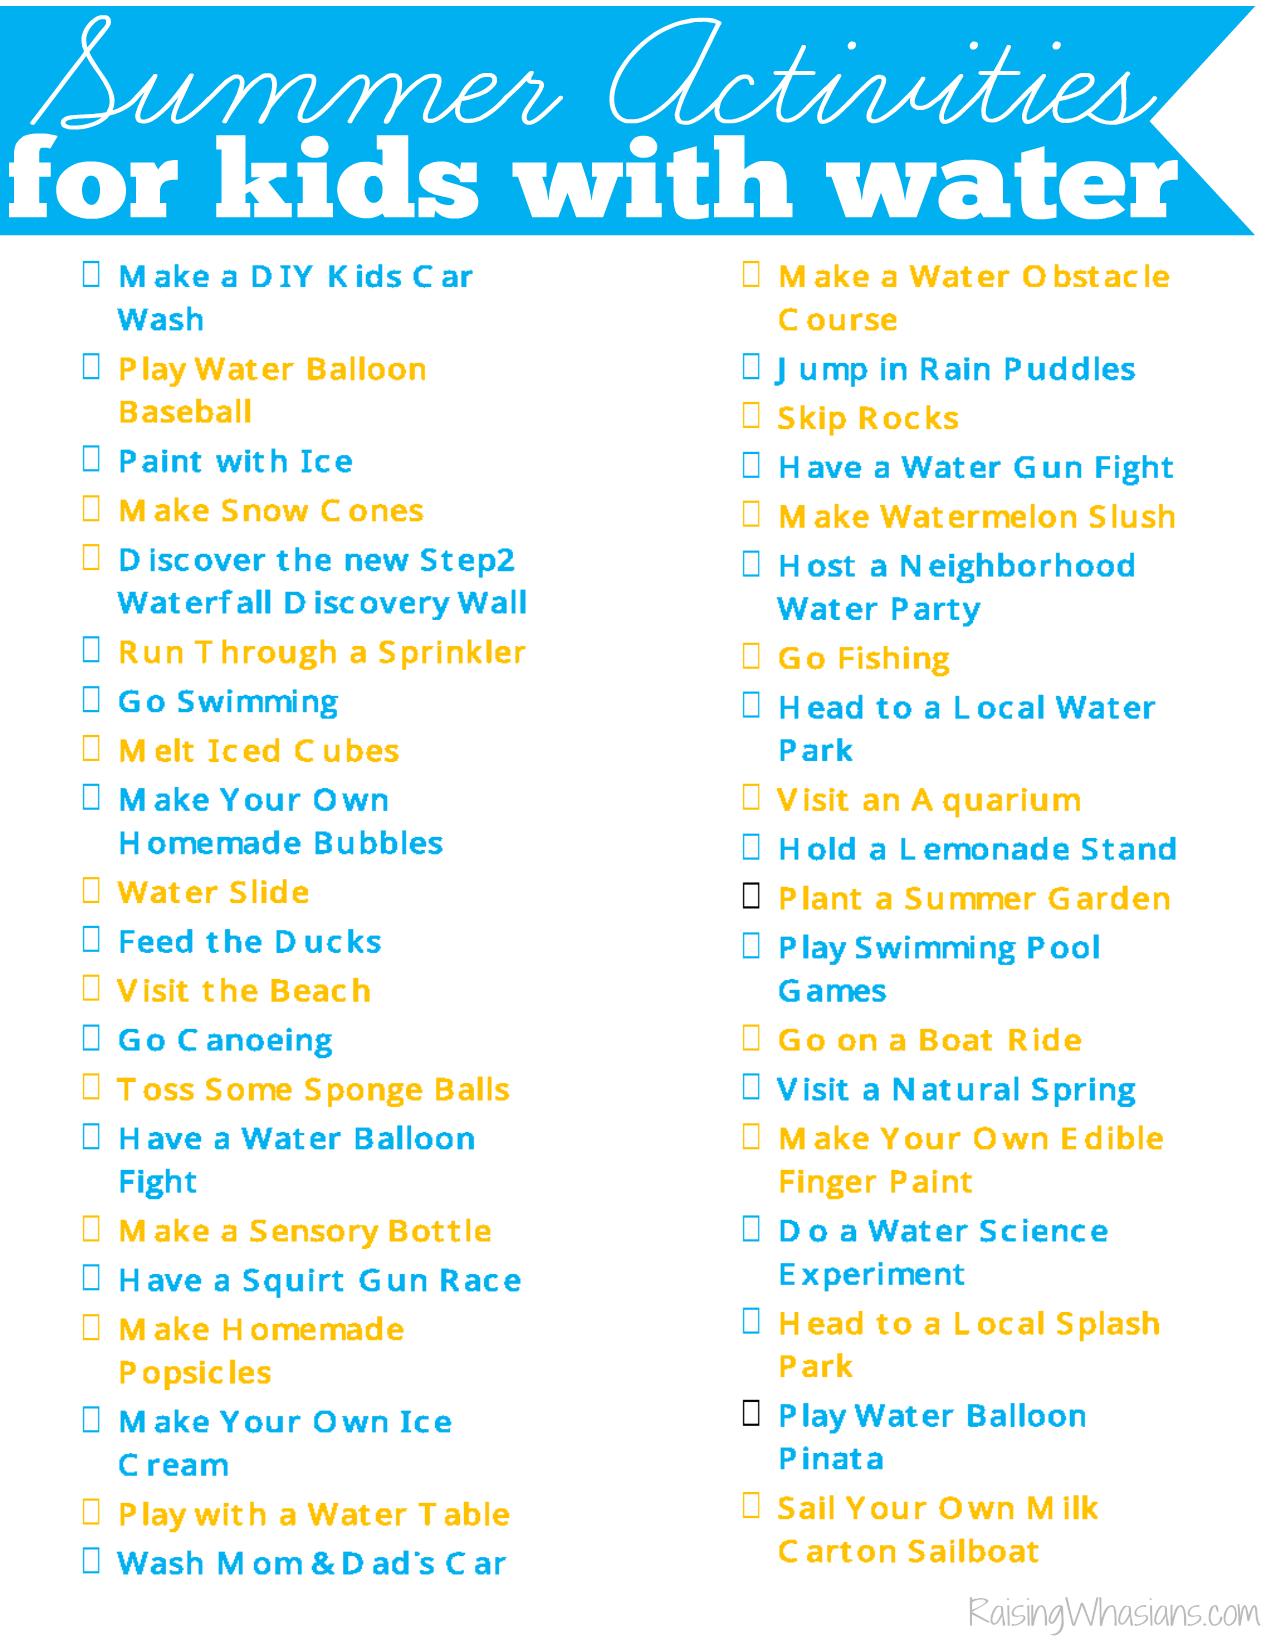 40 Water Summer Activities For Kids Printable Checklist